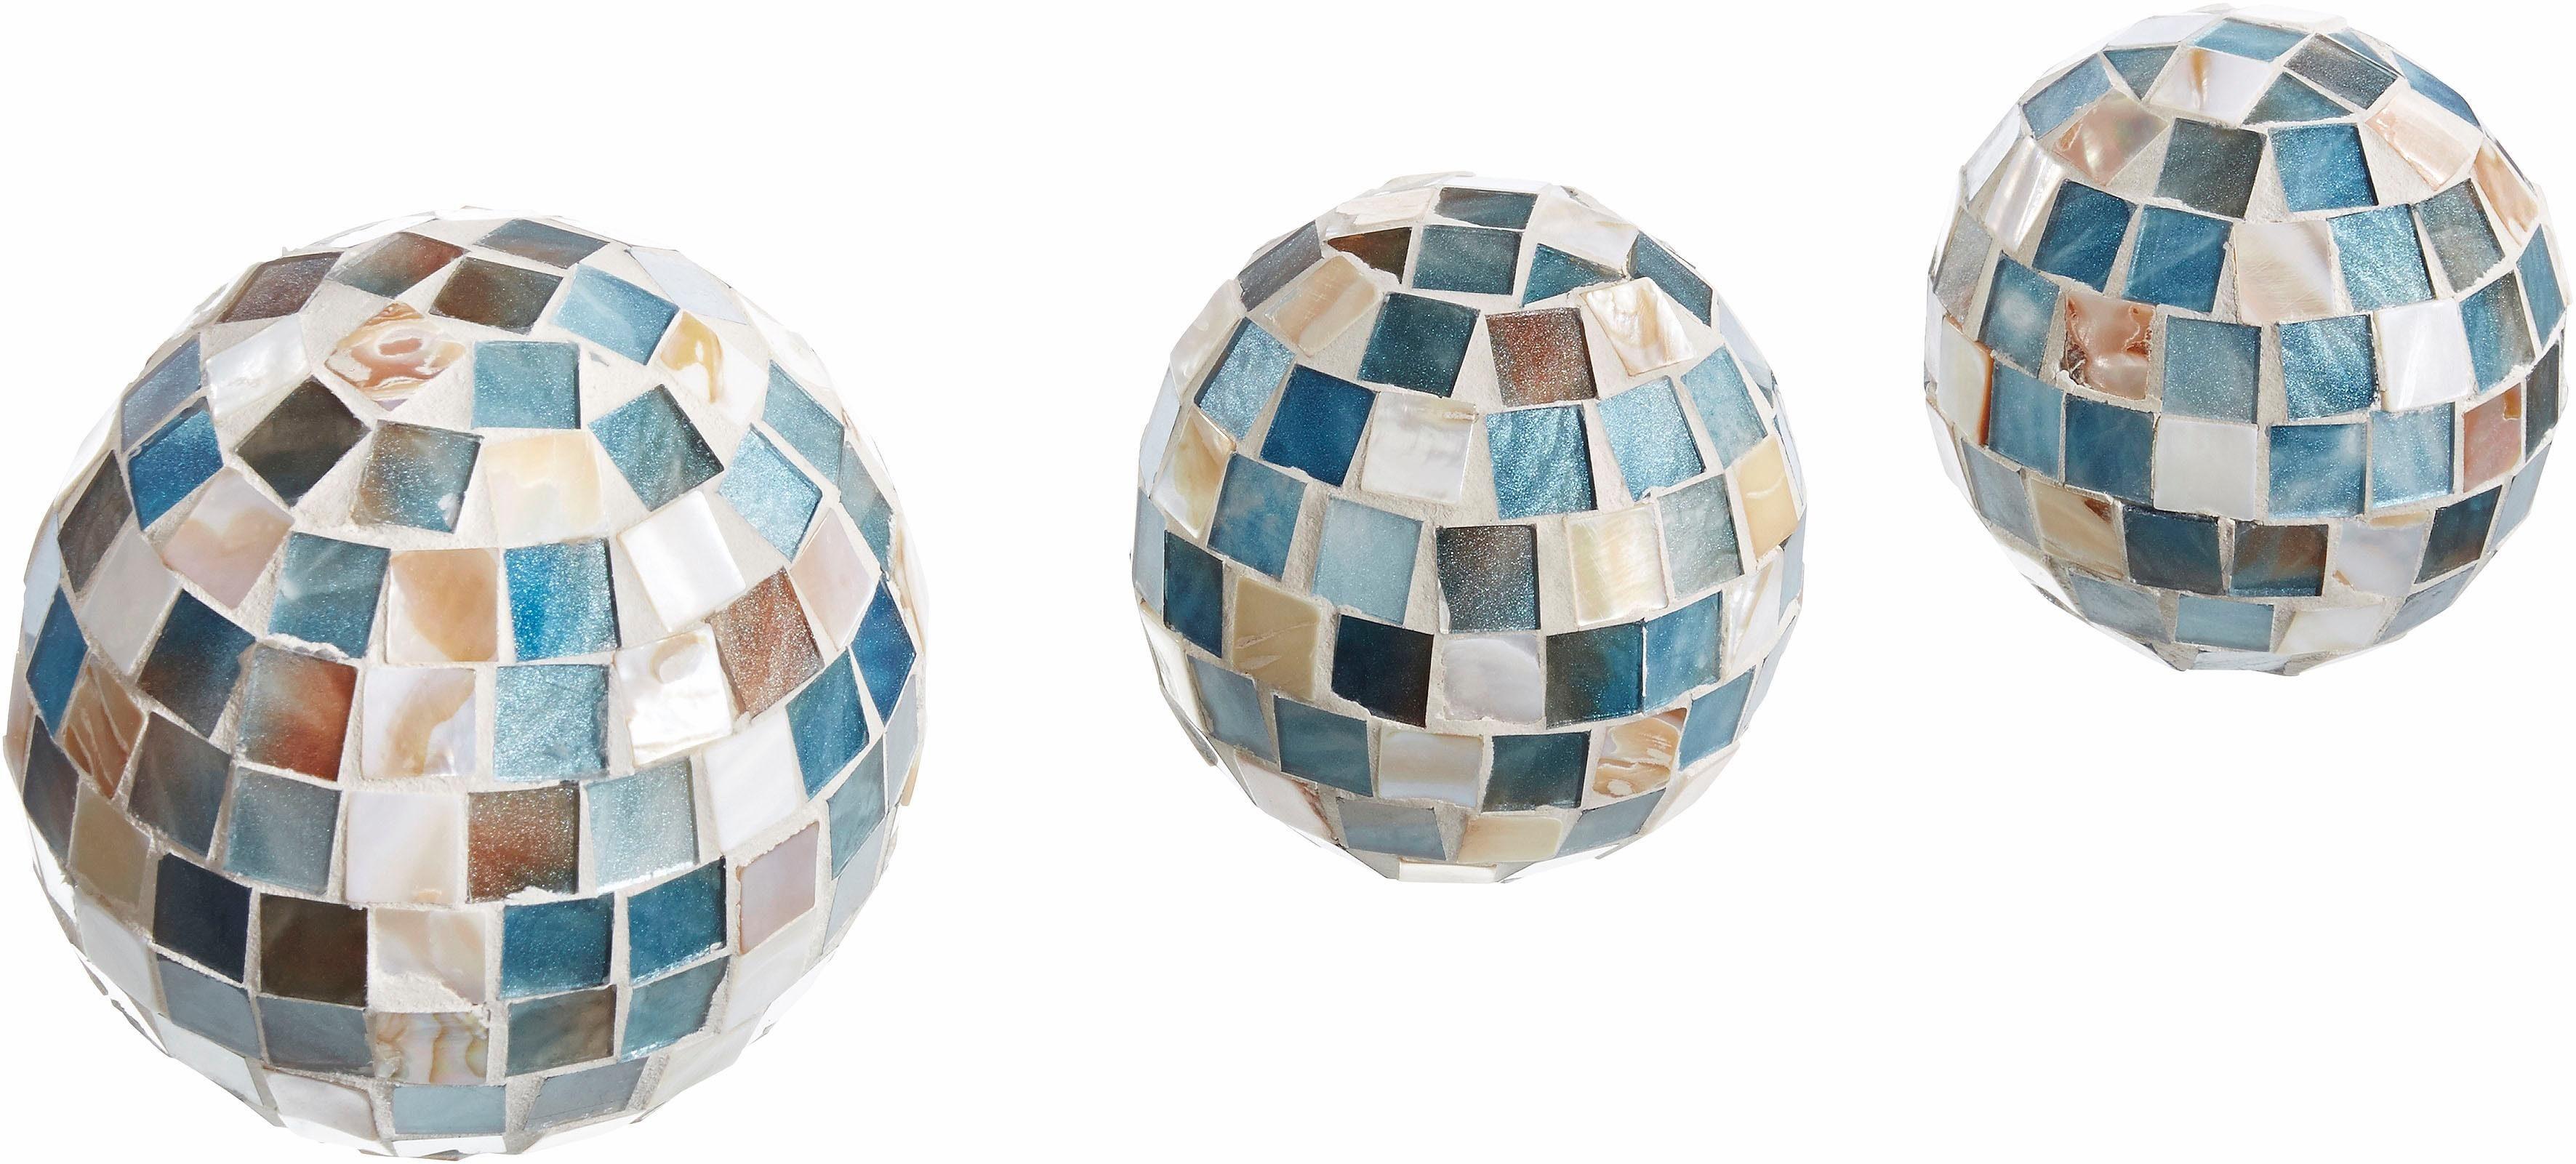 Home affaire Dekokugeln »Mosaik« (3-tlg. Set)